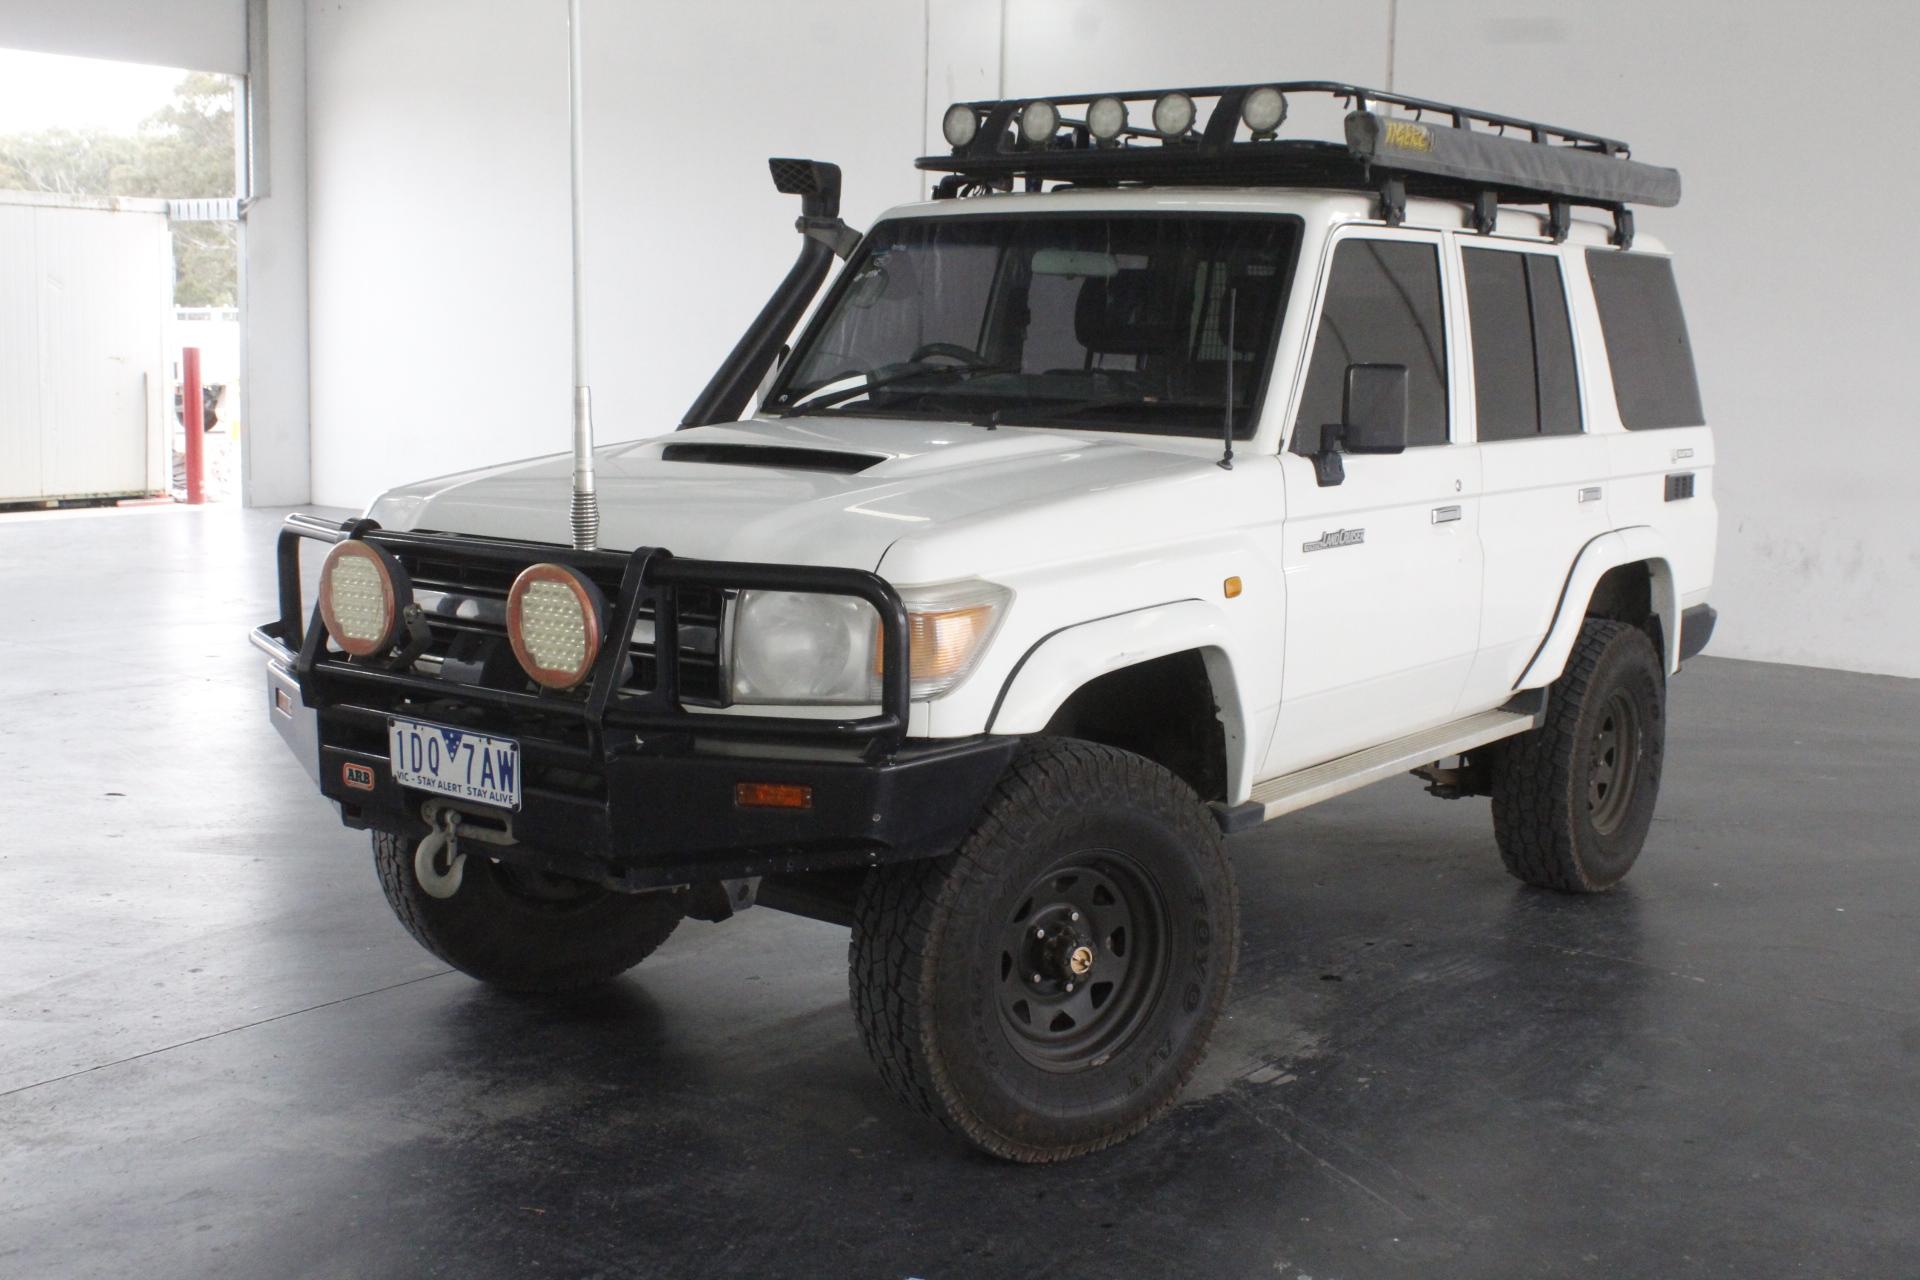 2010 Toyota Landcruiser Workmate (4x4) VDJ76R Turbo Diesel Manual Wagon